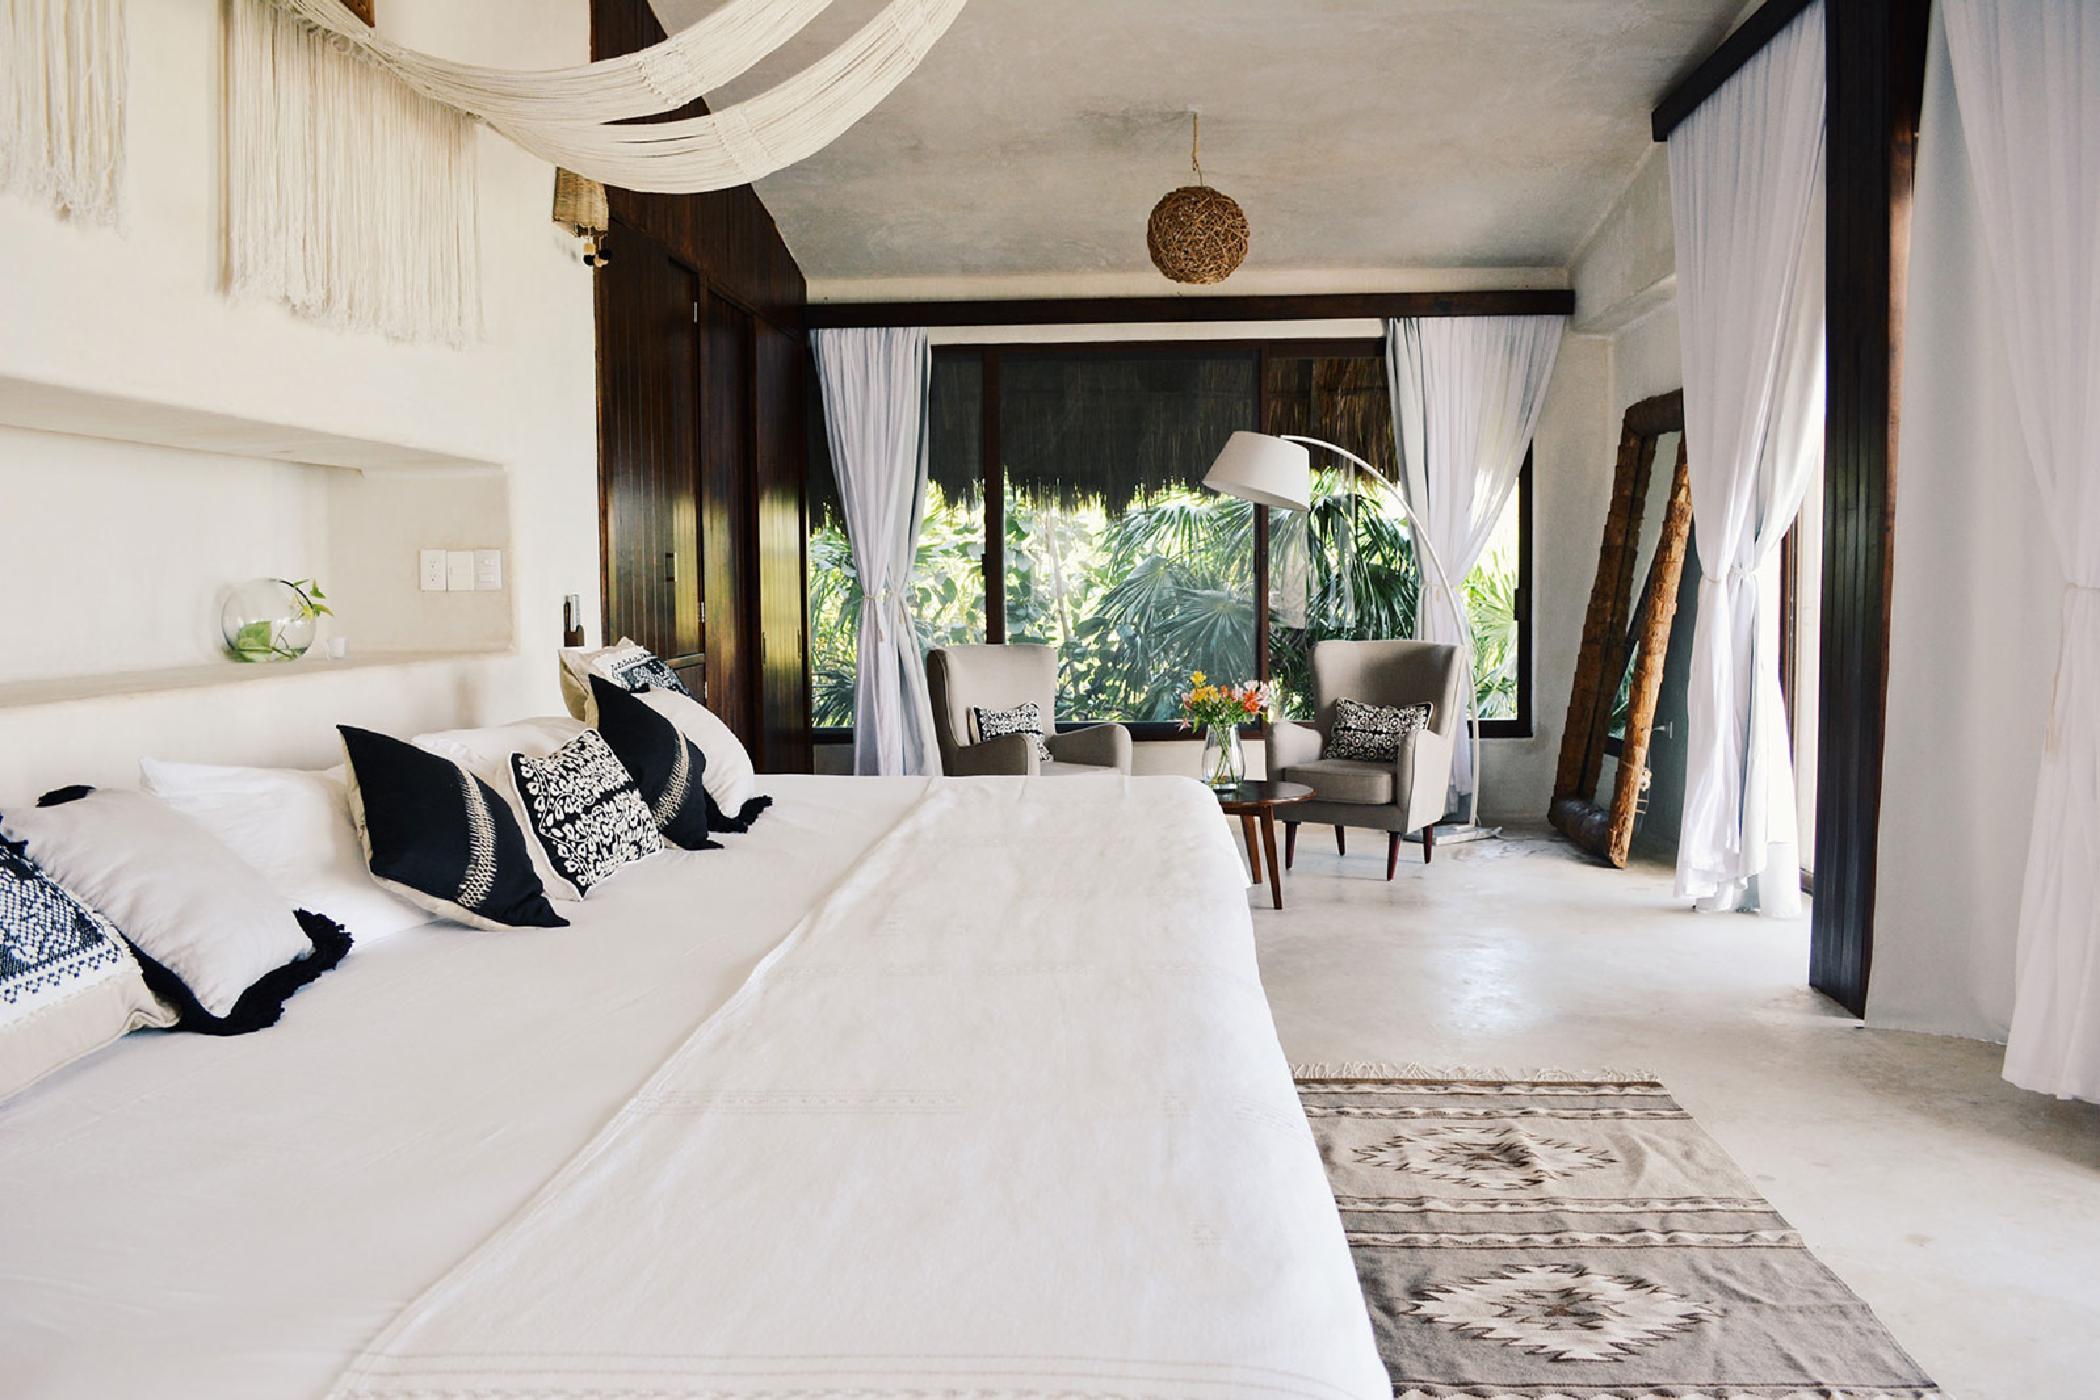 Maya_Luxe_Riviera_Maya_Luxury_Villas_Experiences_Hotel_Zone_Tulum_Beach_5_Bedrooms_Casa_Palapa_11.jpg